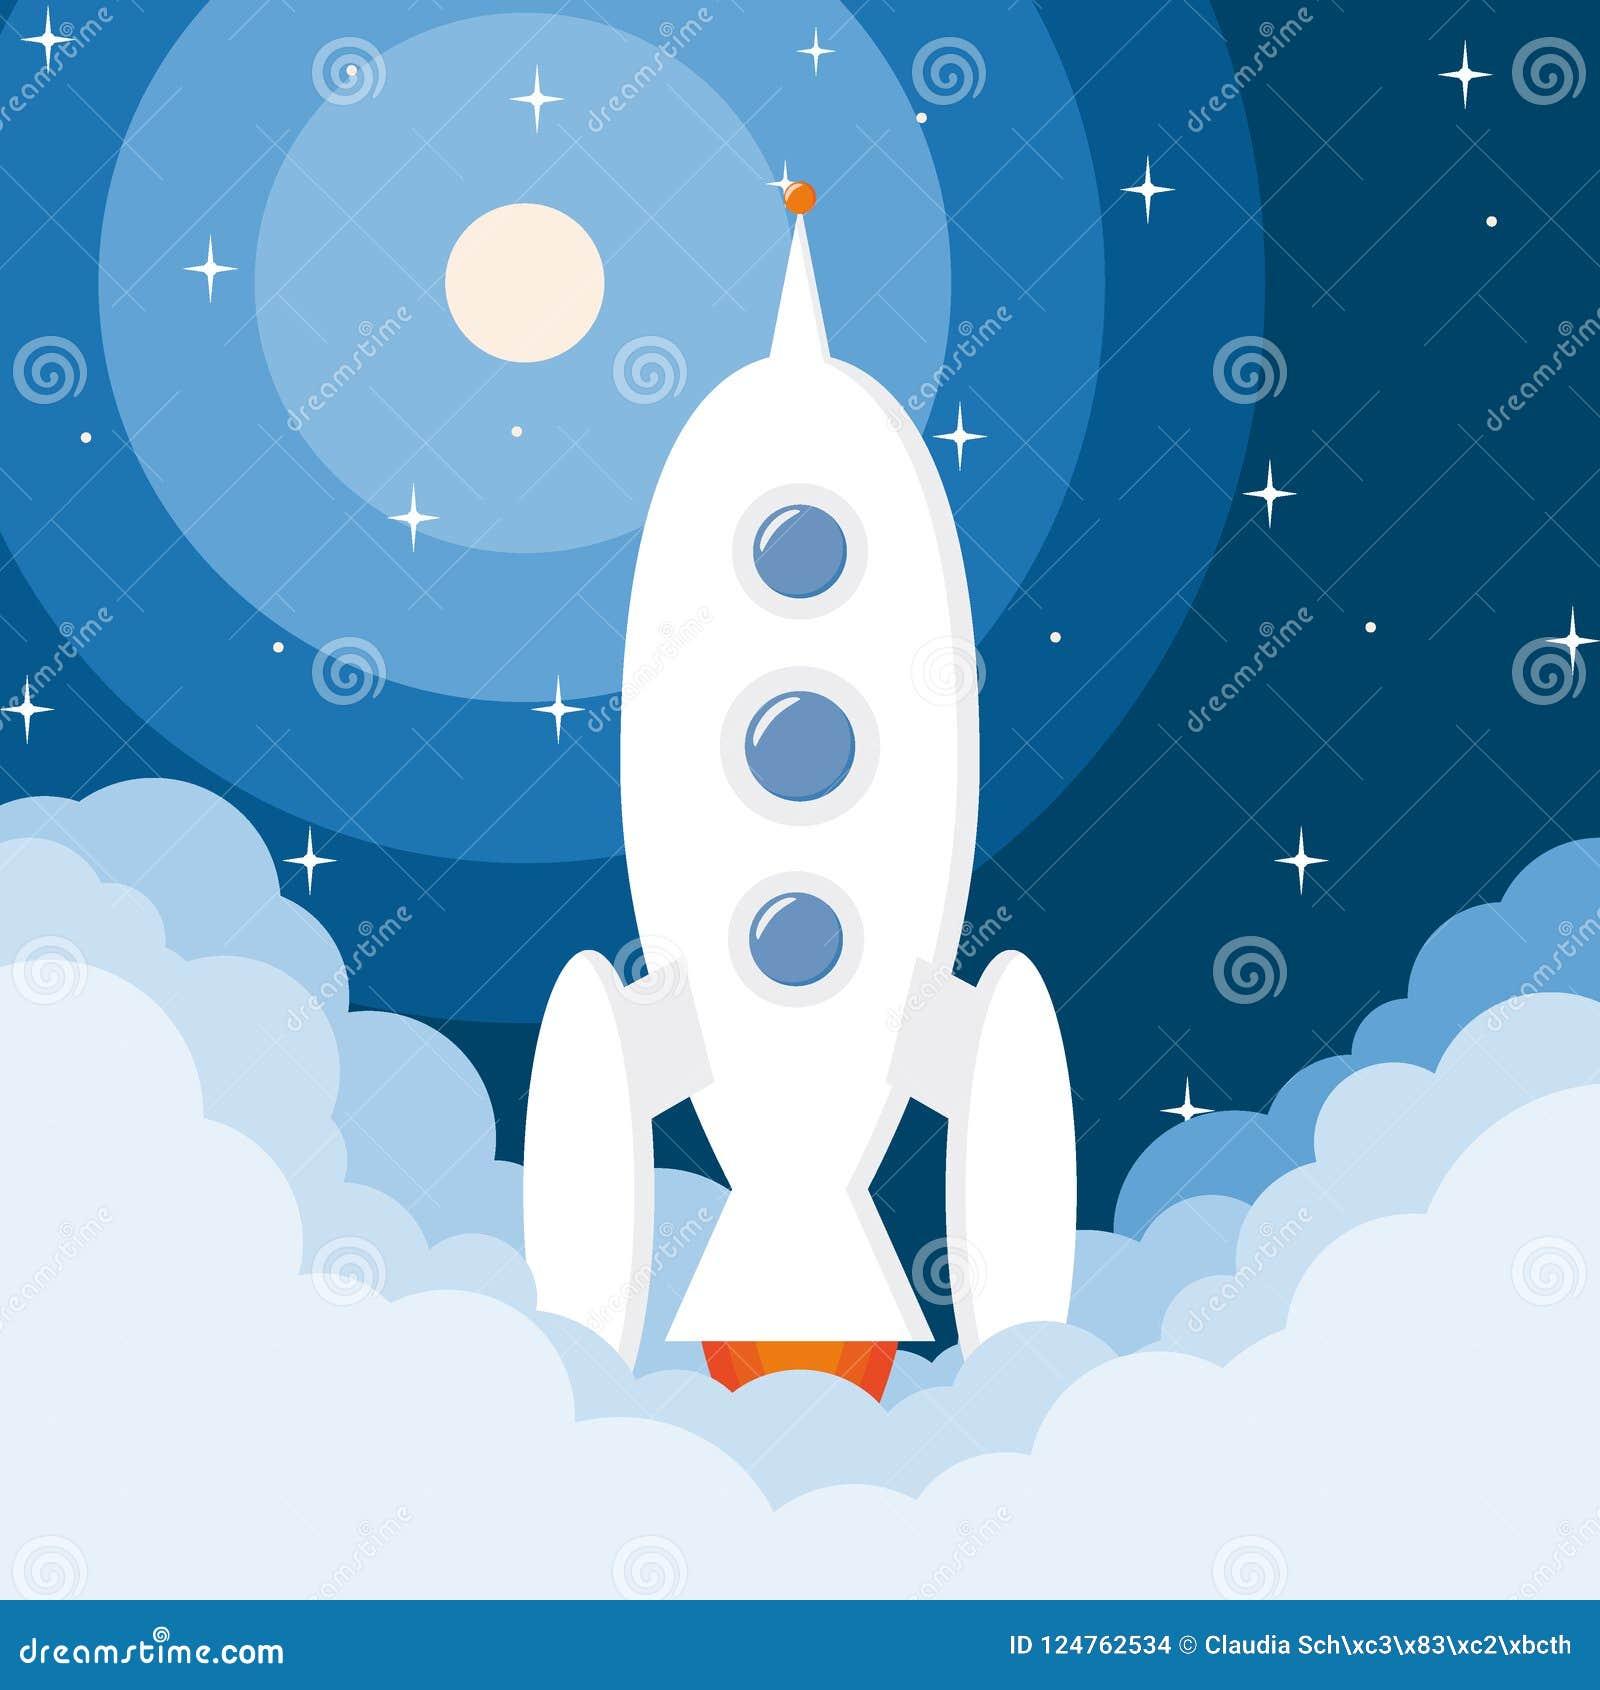 Spaceship launch rocket start-up with stars